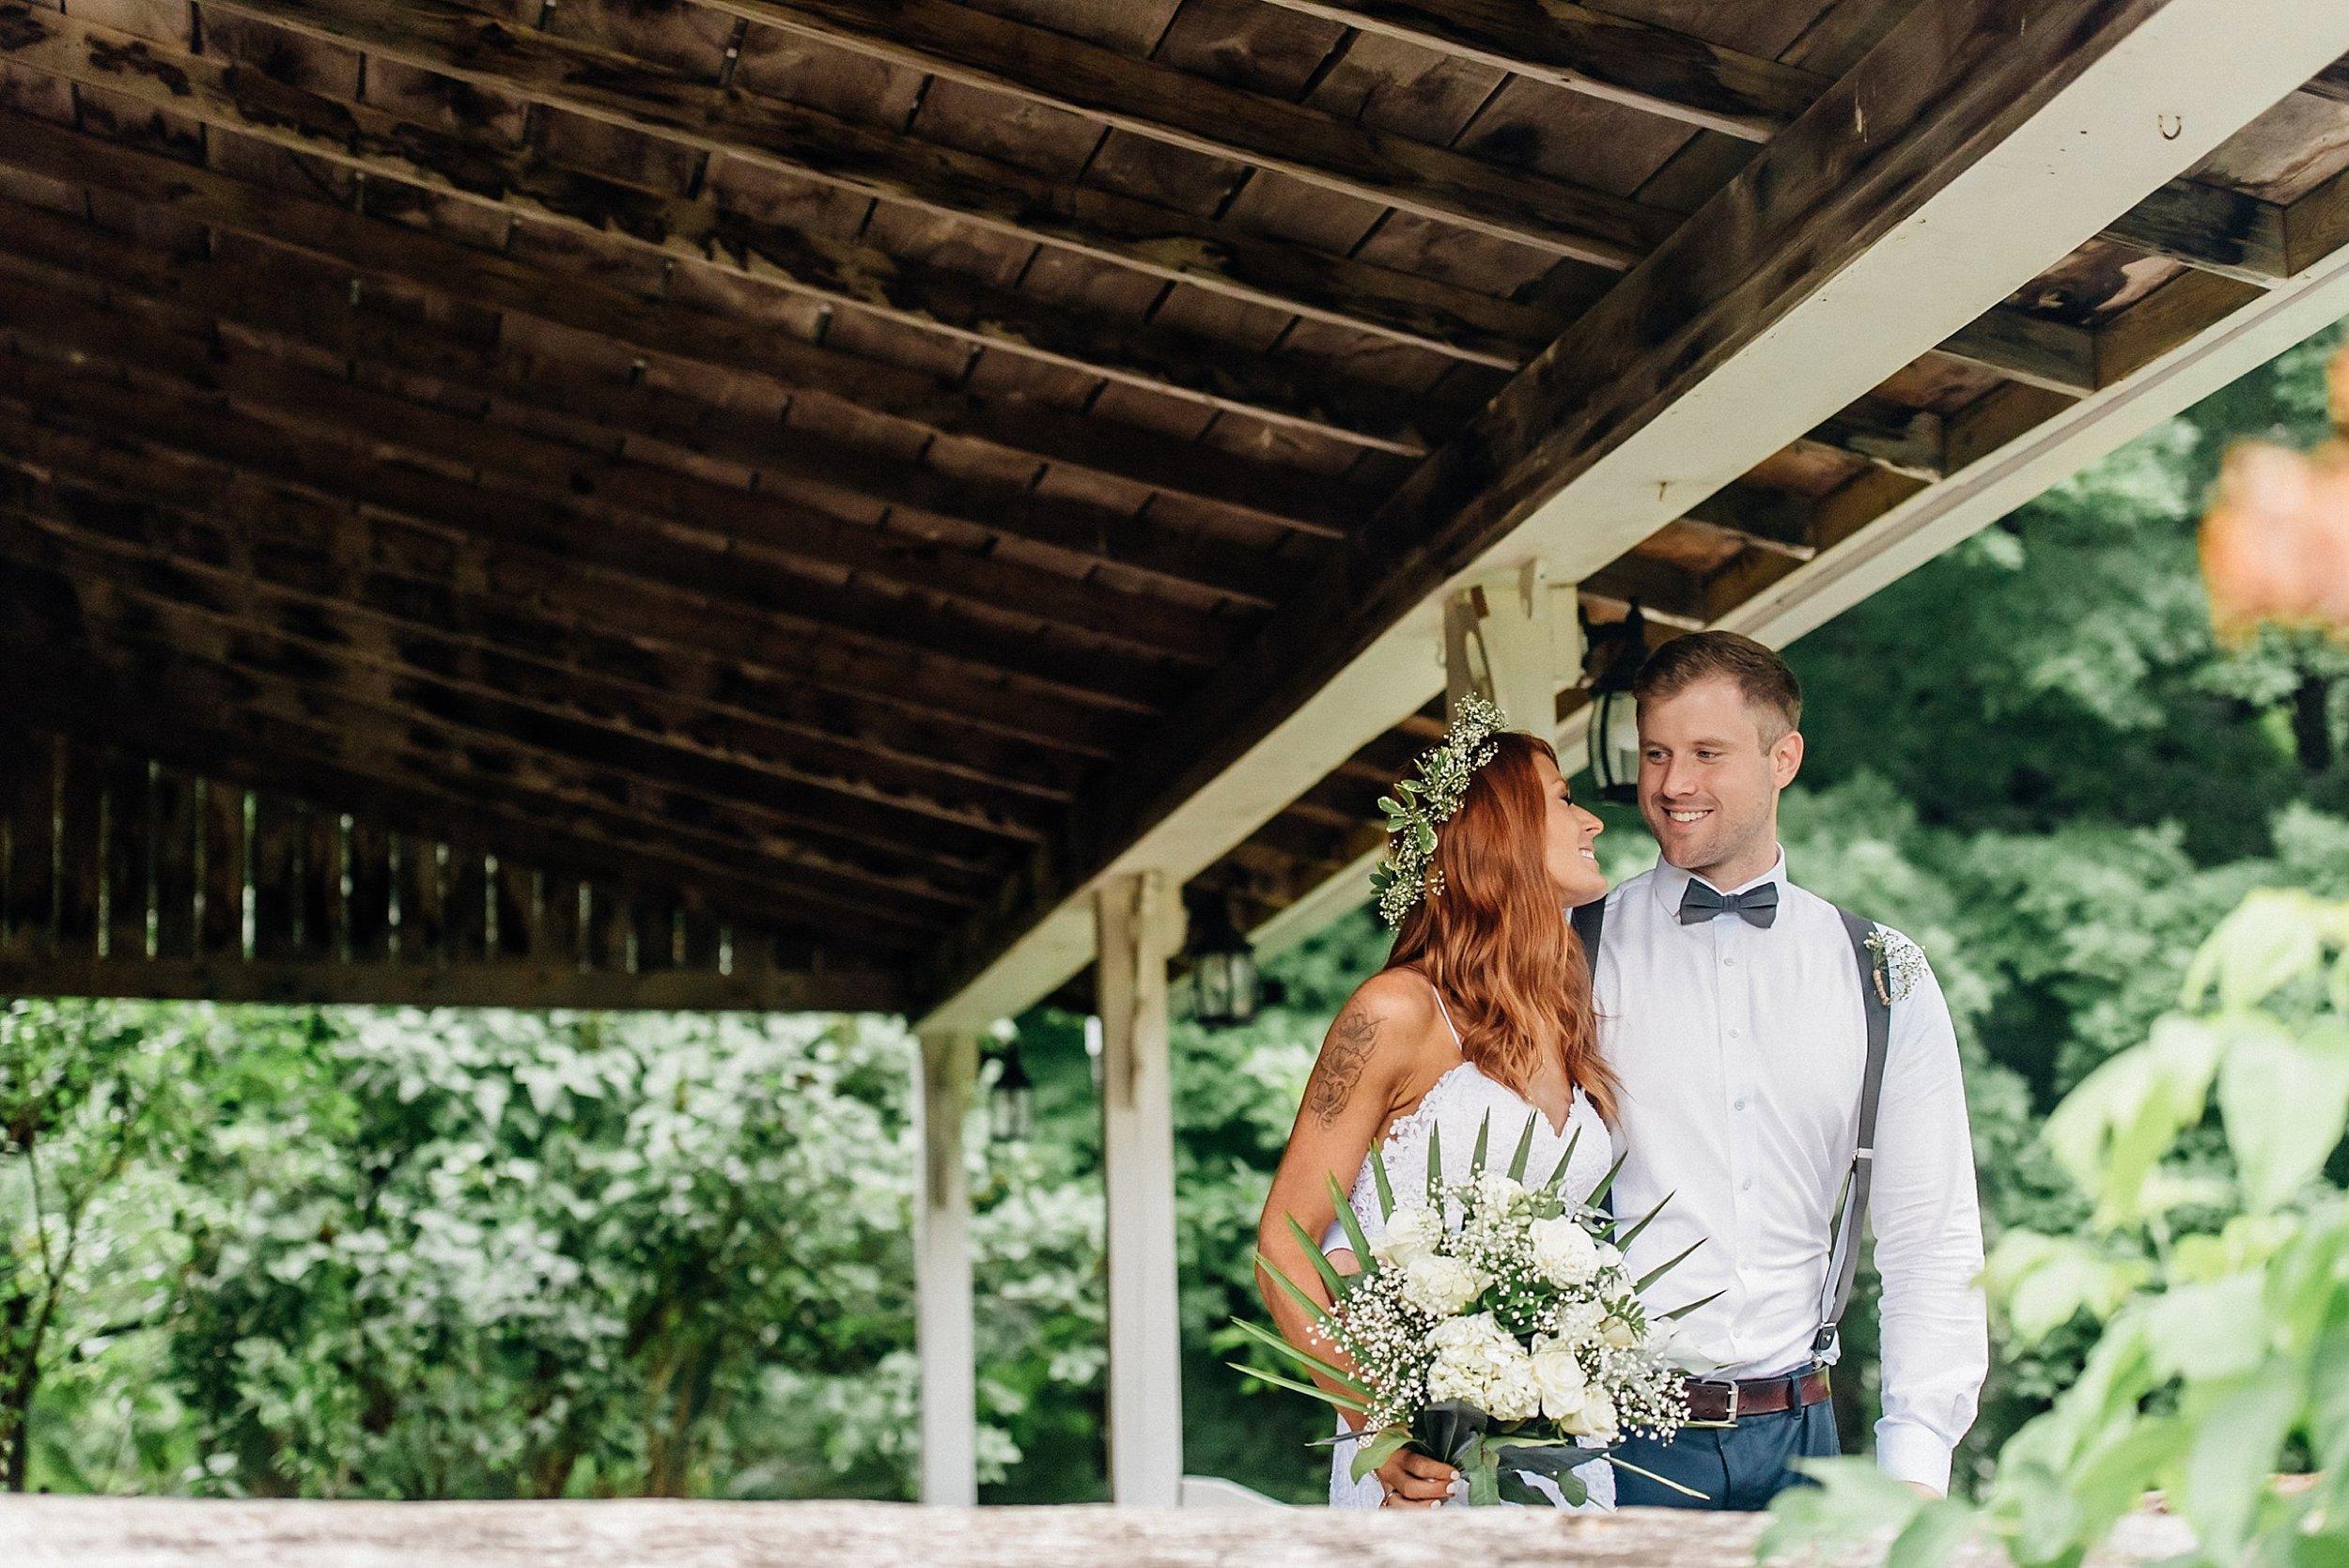 Ottawa Wedding Photographer - Stanley's Olde Maple Lane Barn Wedding - Ali & Batoul Photography_0049.jpg